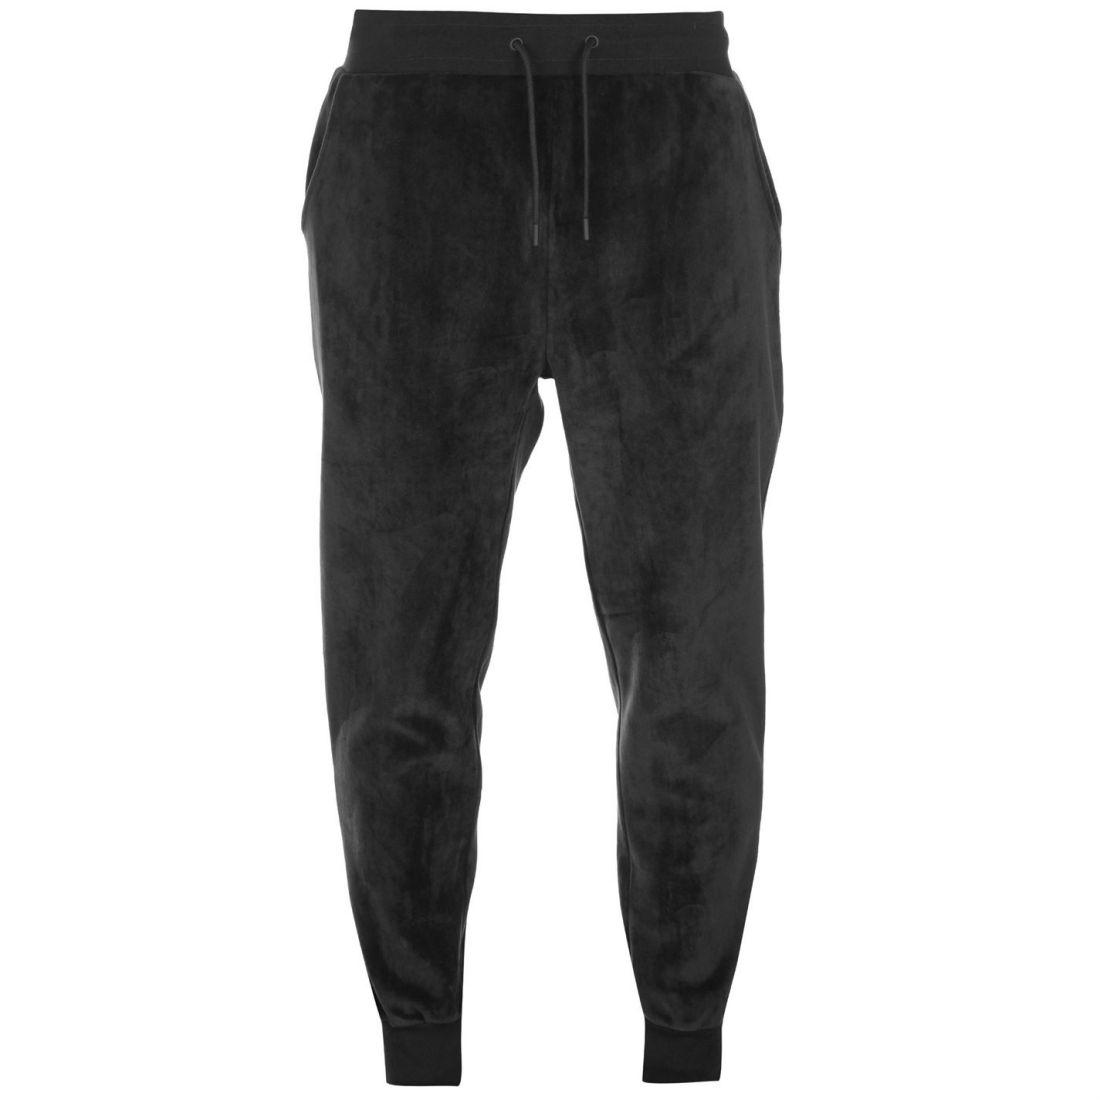 02f9c26ad512 Image is loading Fabric-Velvet-Sweatpants-Mens-Gents-Fleece-Jogging-Bottoms-